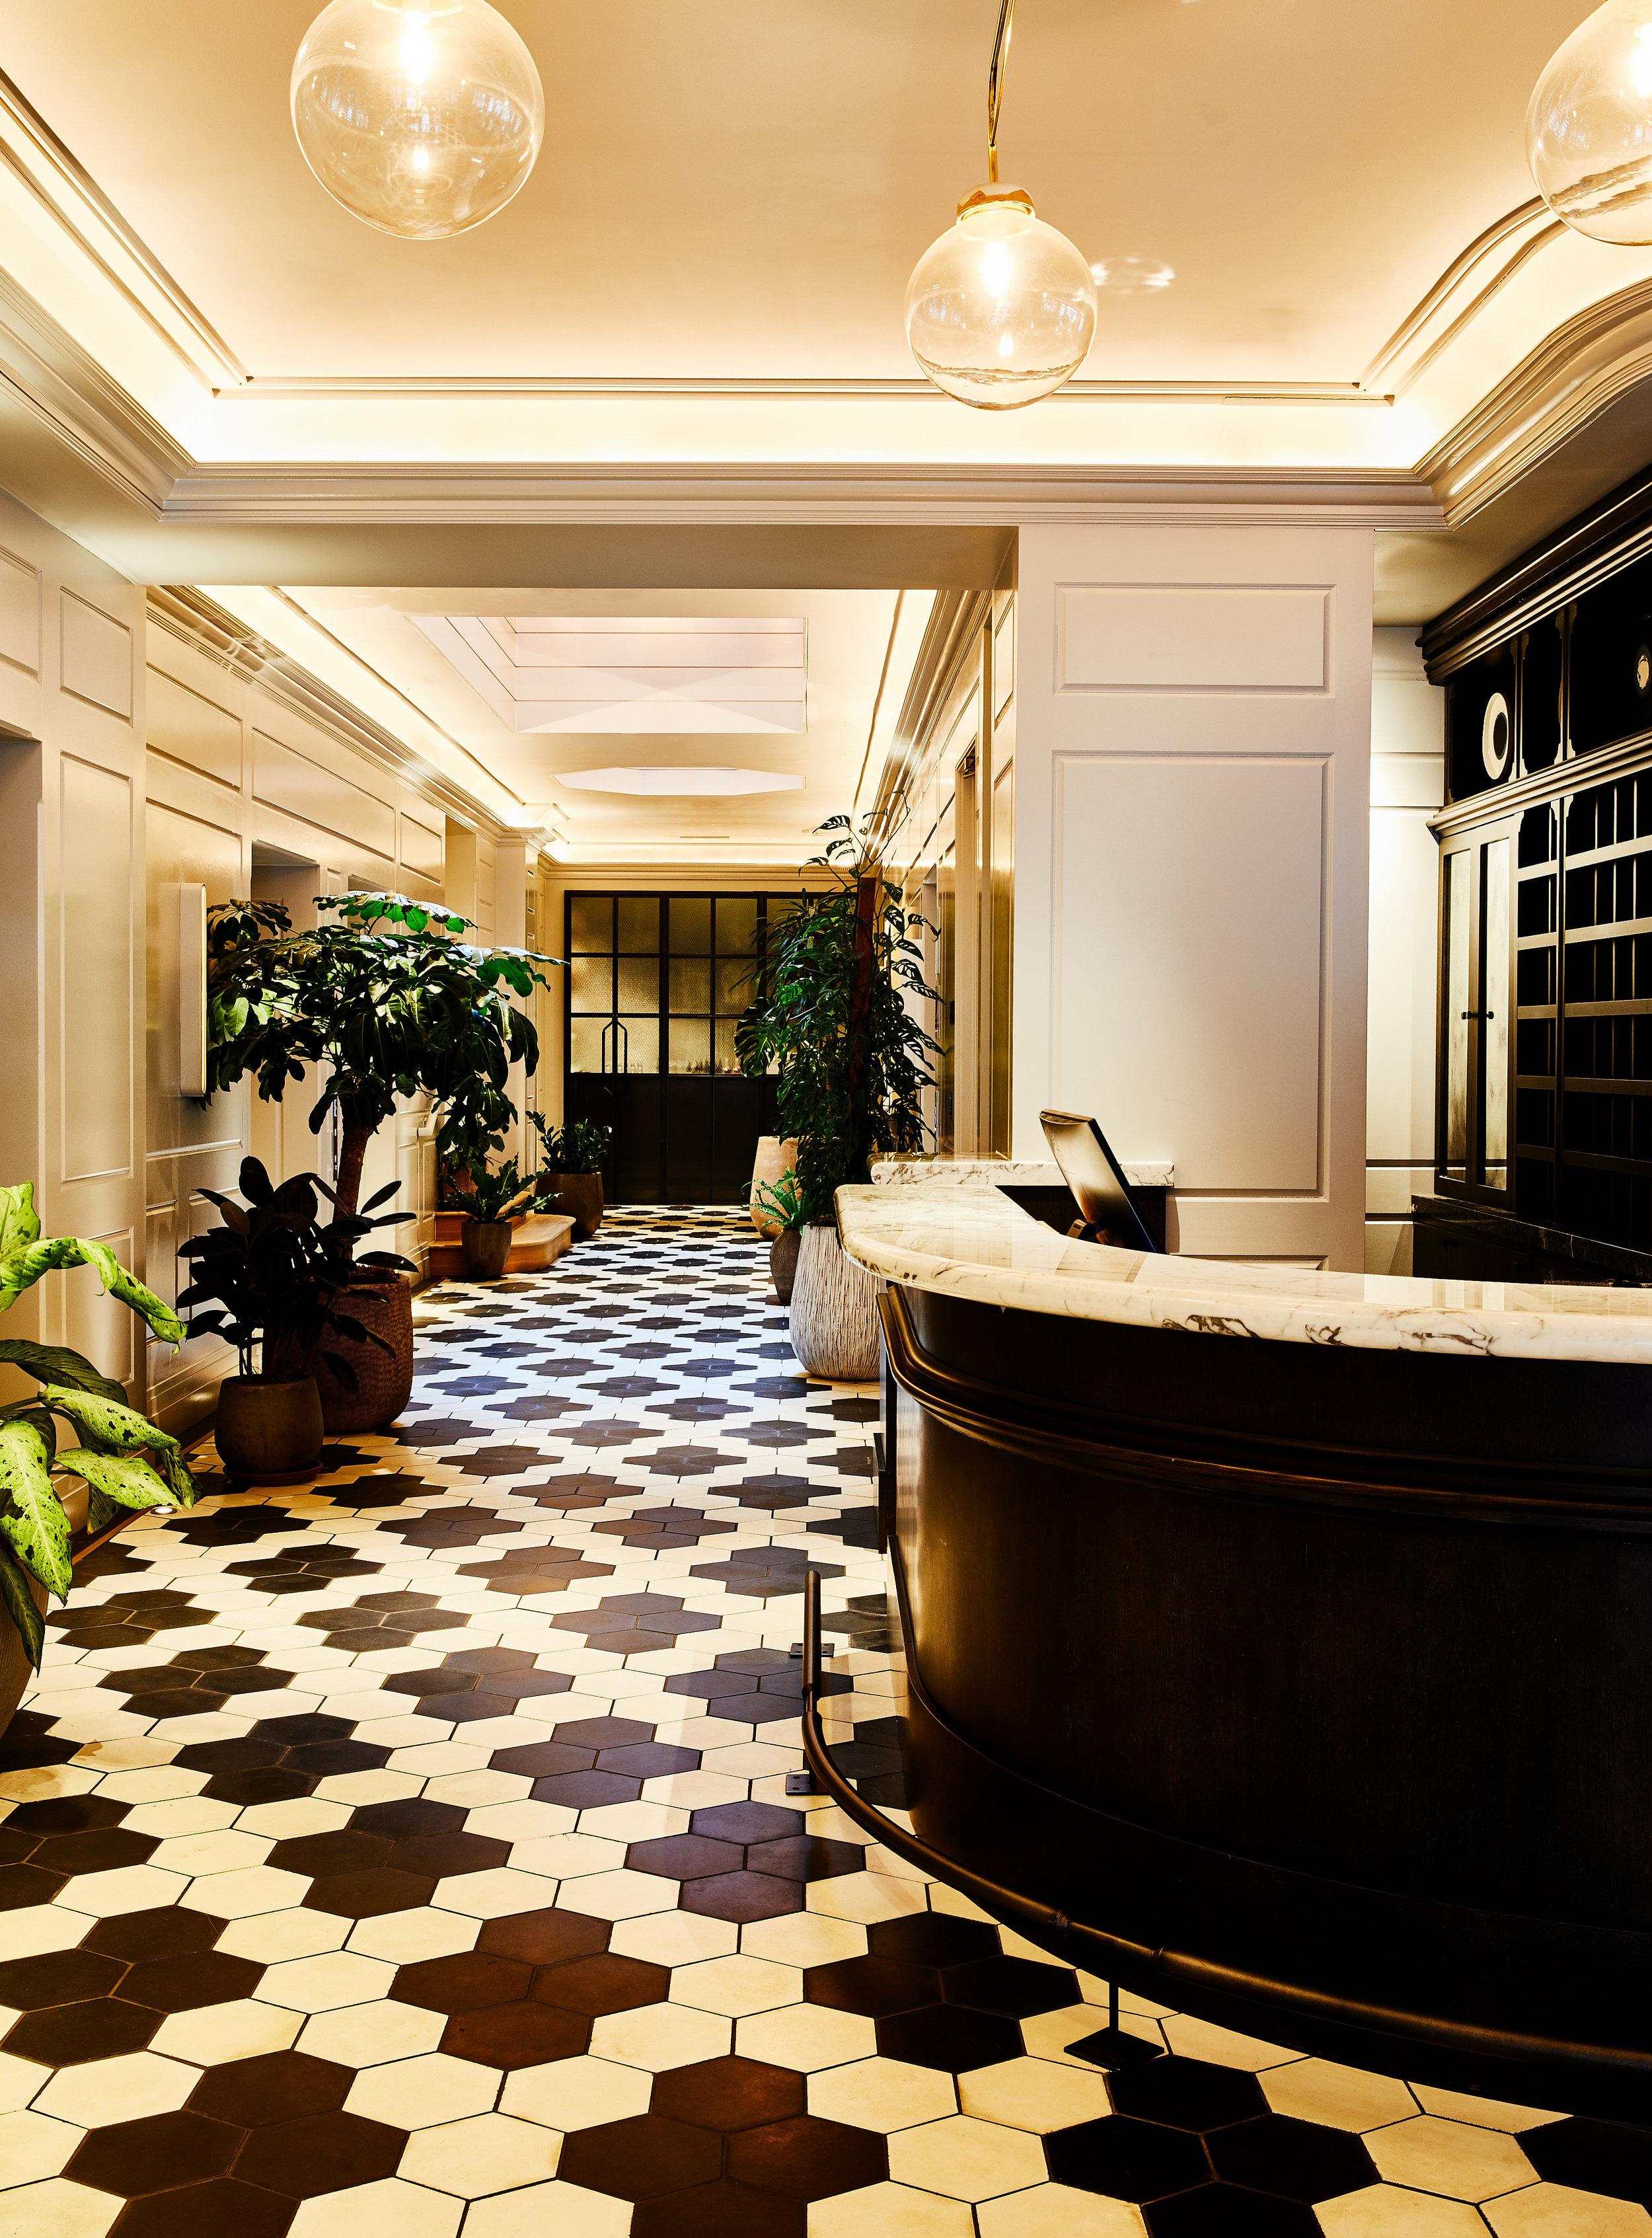 CH_S_Hanes_Woodlark_Hotel_PDX_572.jpg